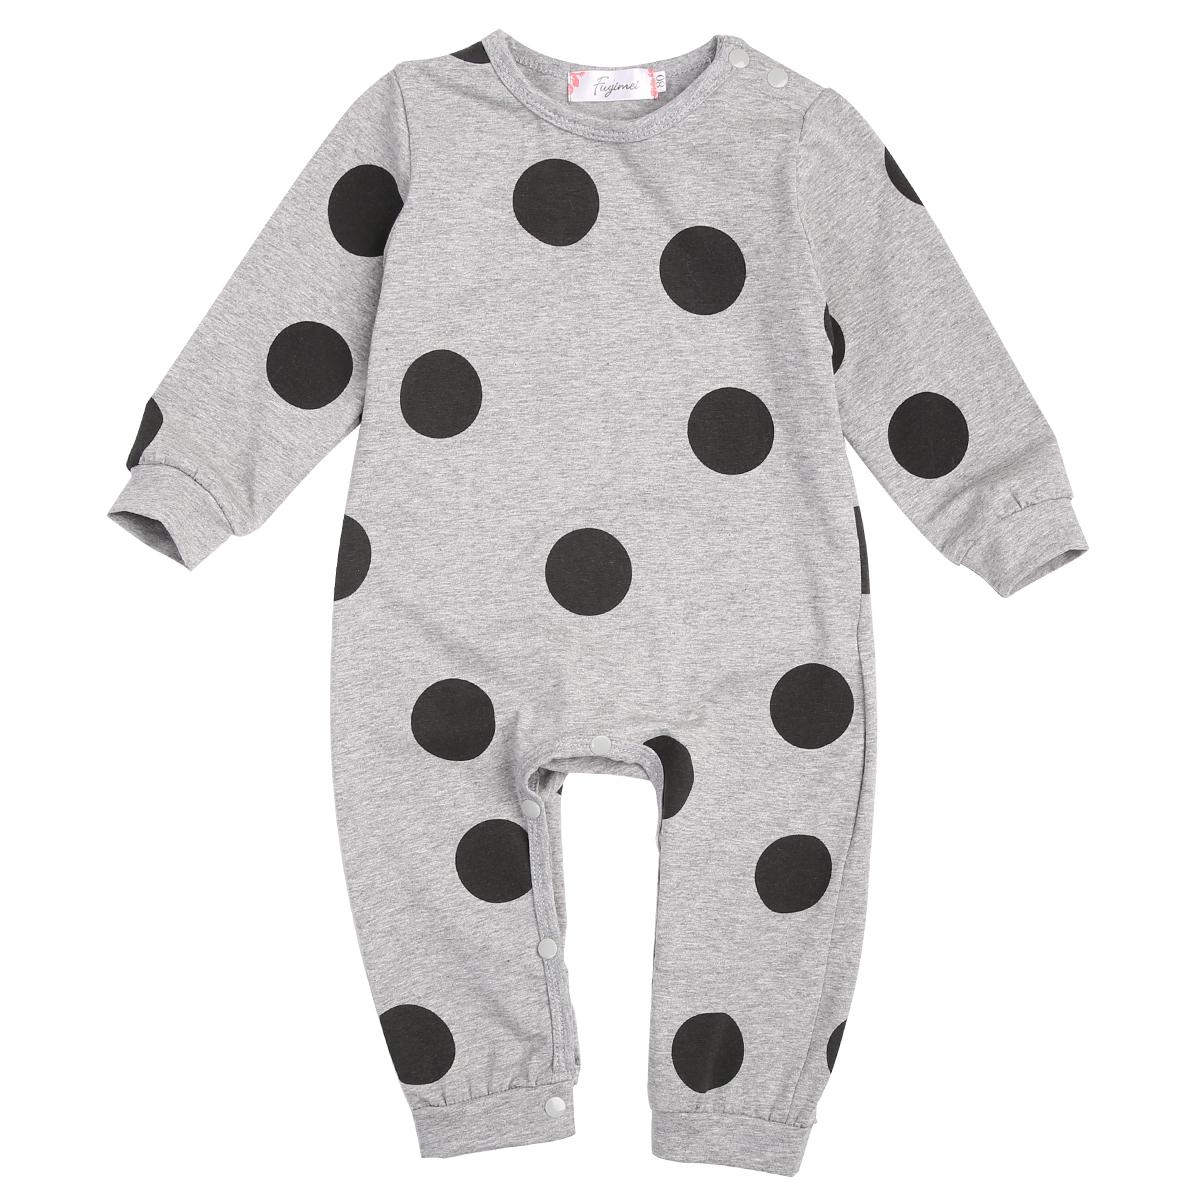 2016 Fashion Baby Girls Boys Cotton Romper Newborn Summer Jumpsuit Infant Pajamas(China (Mainland))